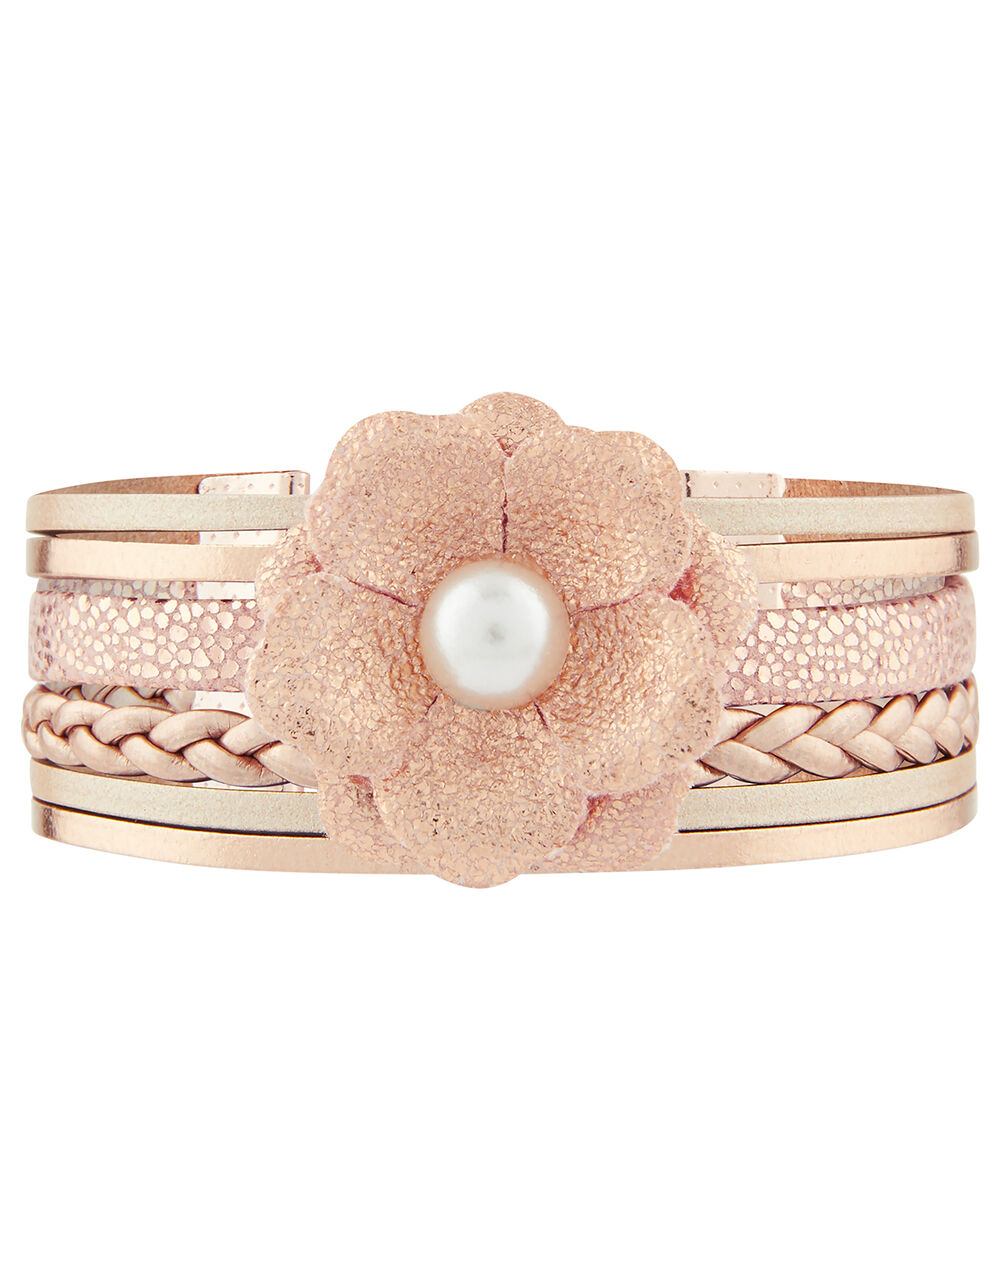 Ophelia Layered Floral Bracelet, , large